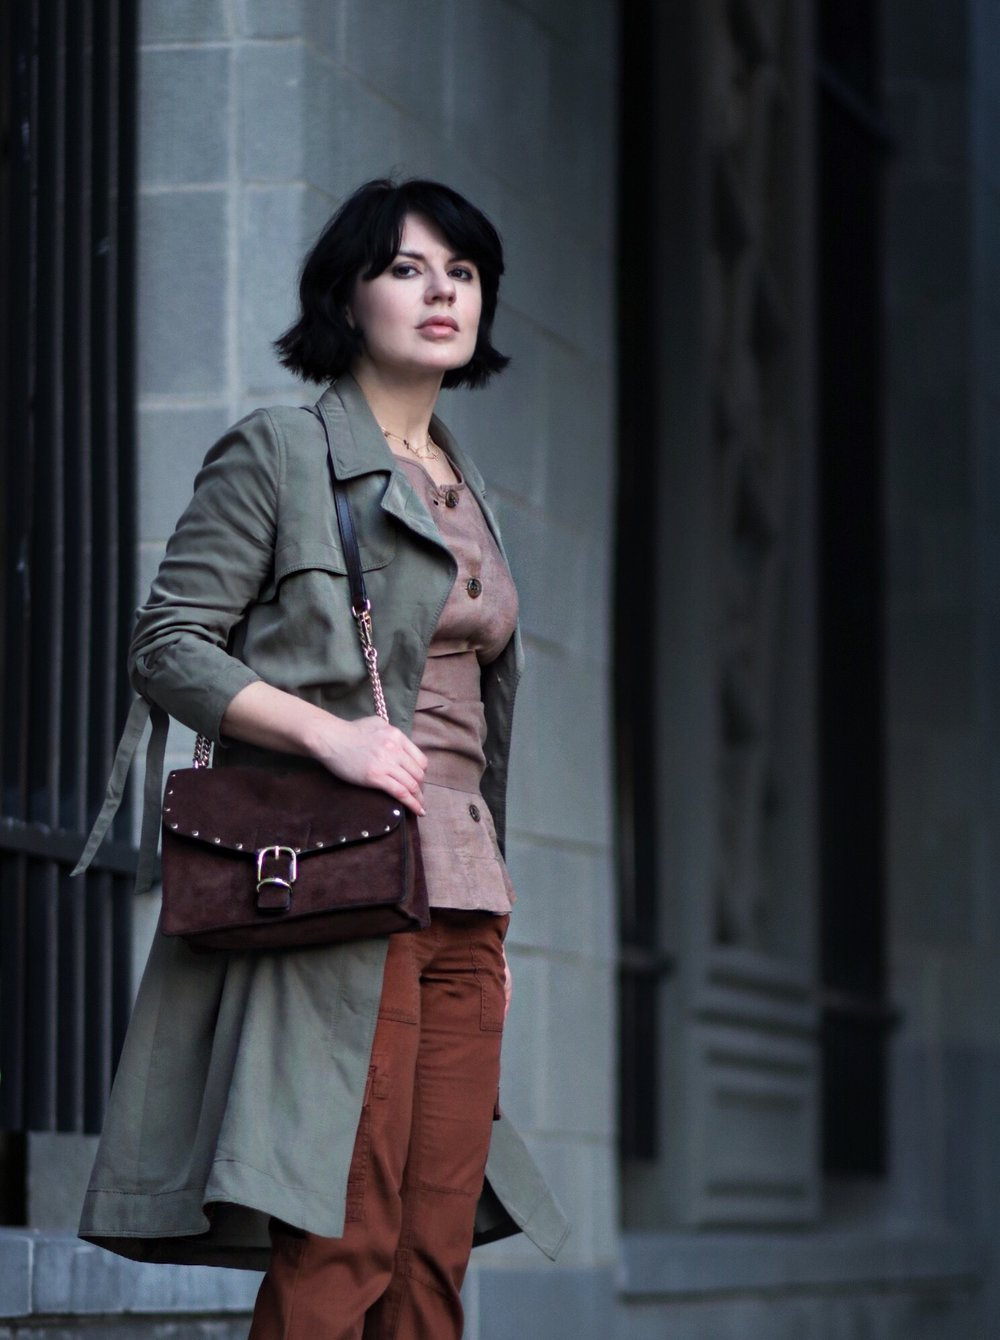 rebecca-minkoff-suede-studded-bag-blogger-fashion